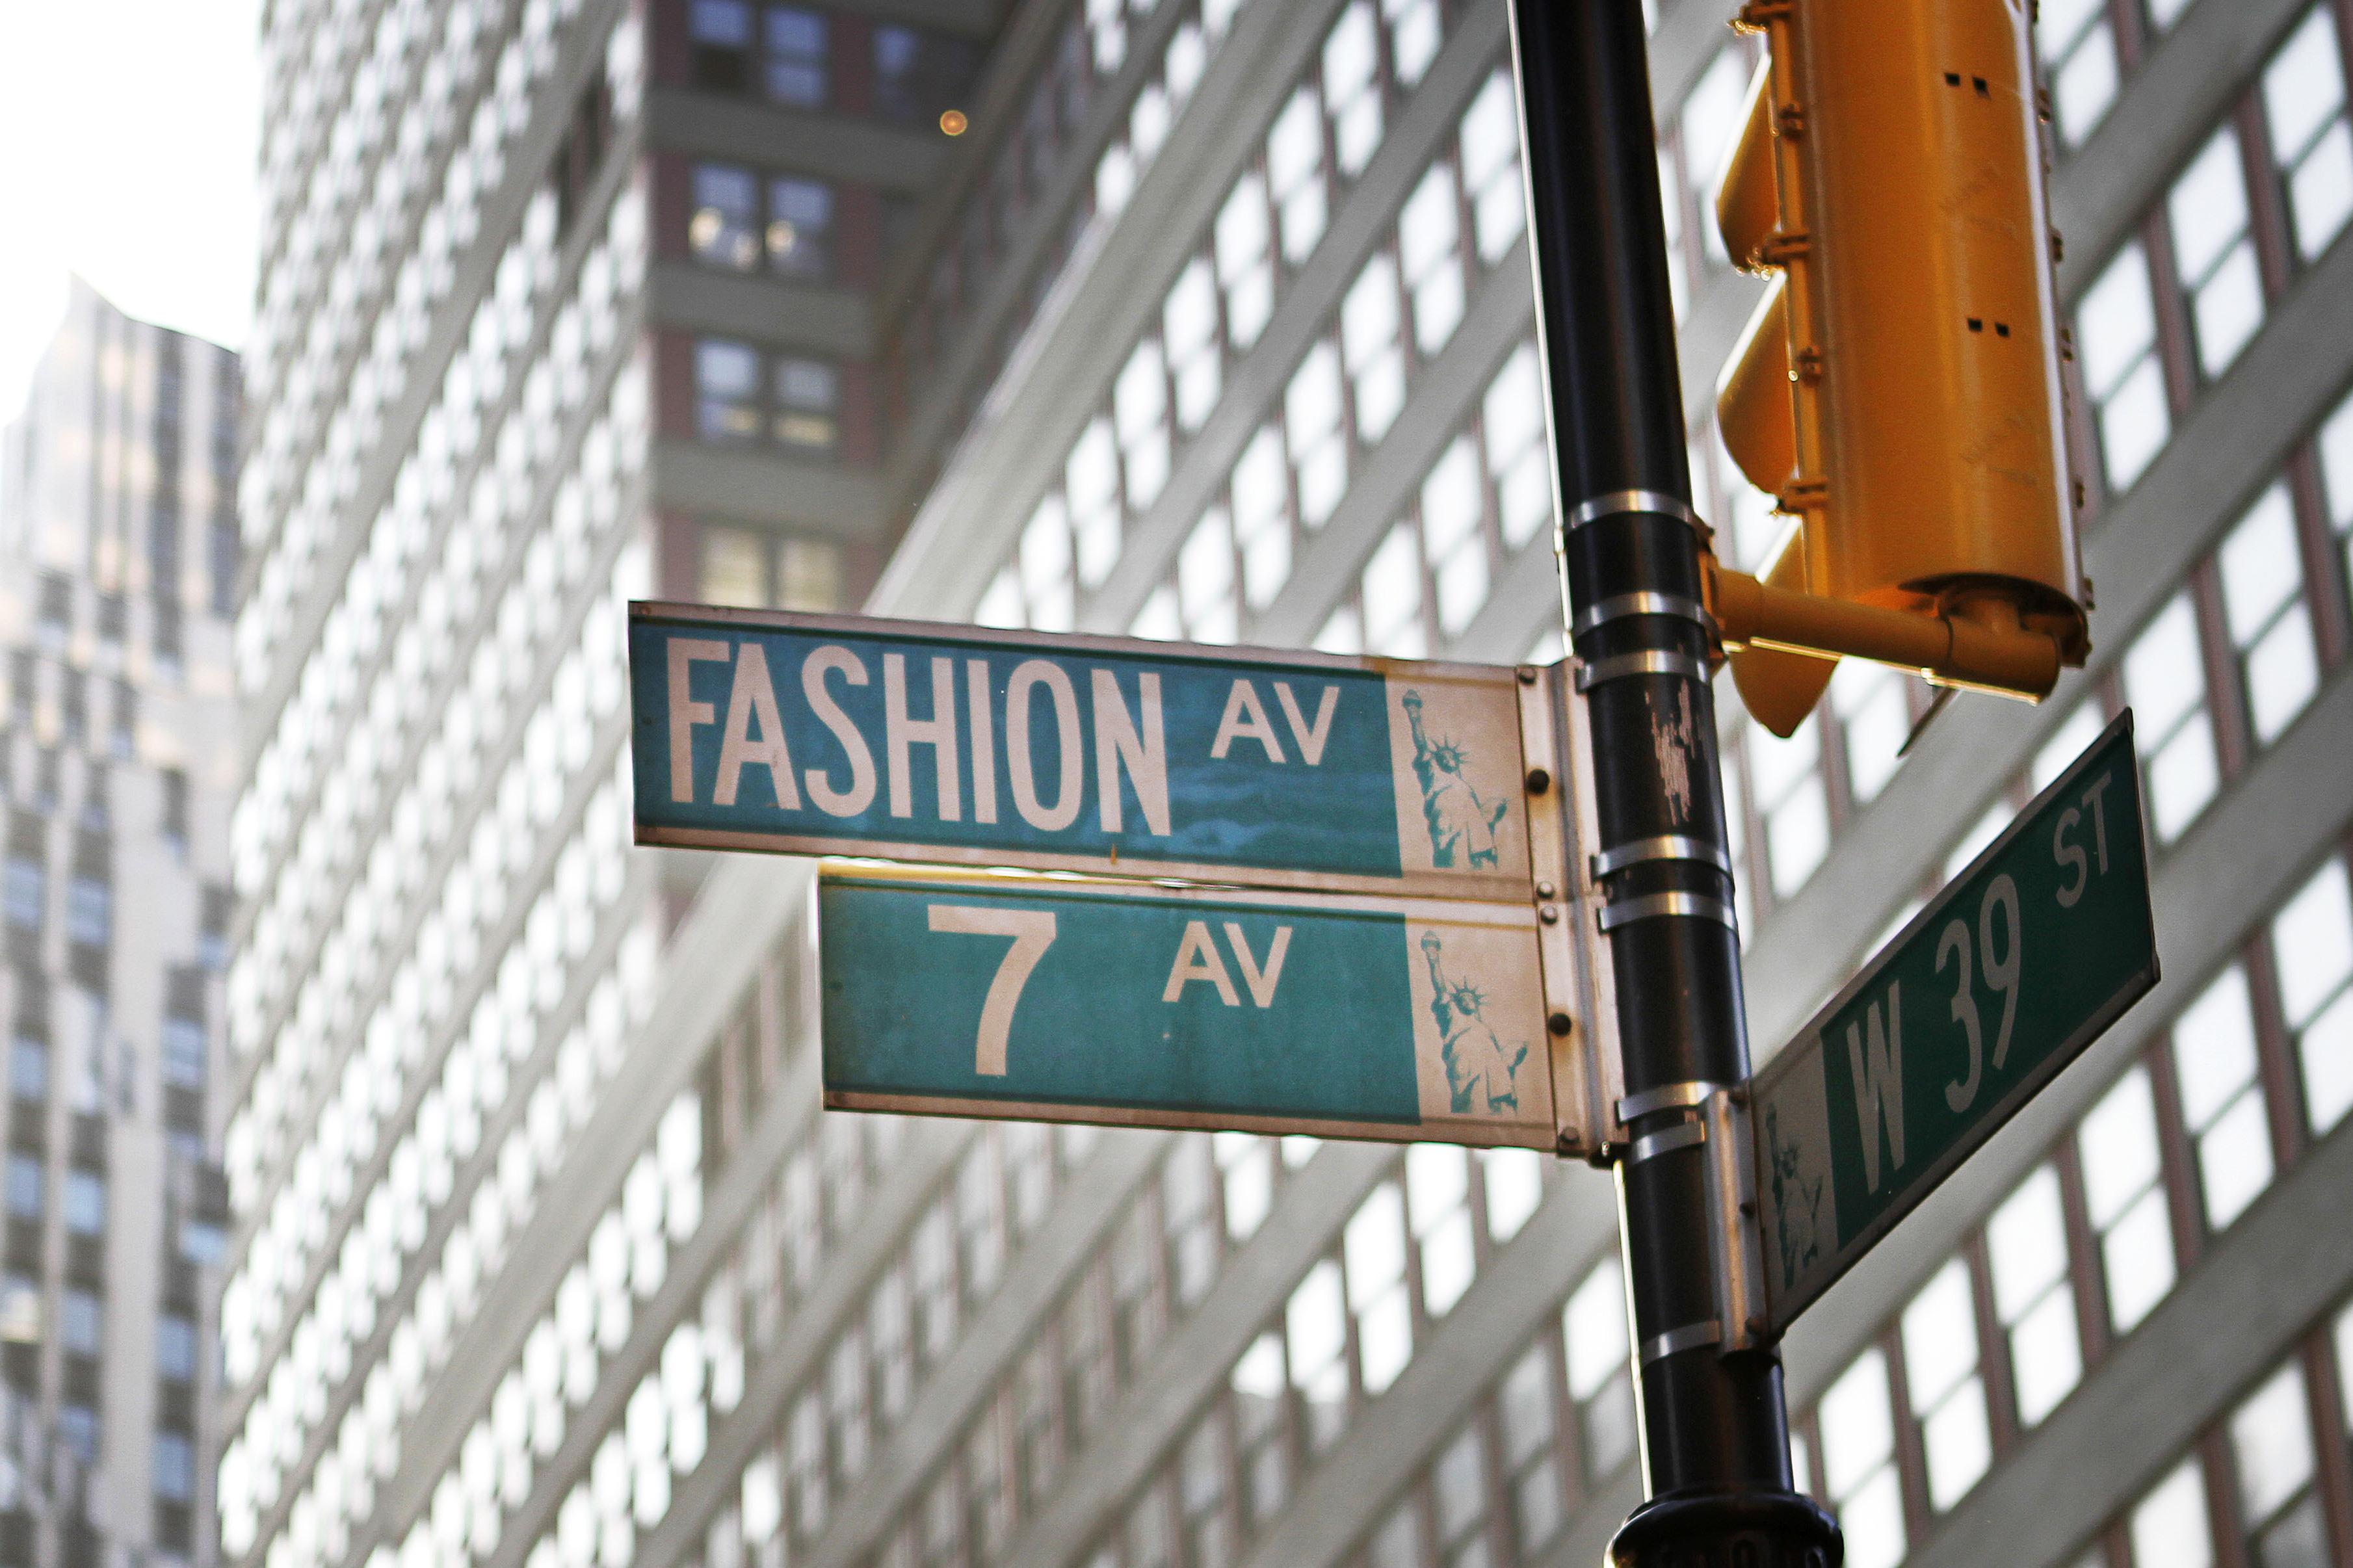 Fashion avenue clothing. Clothing stores